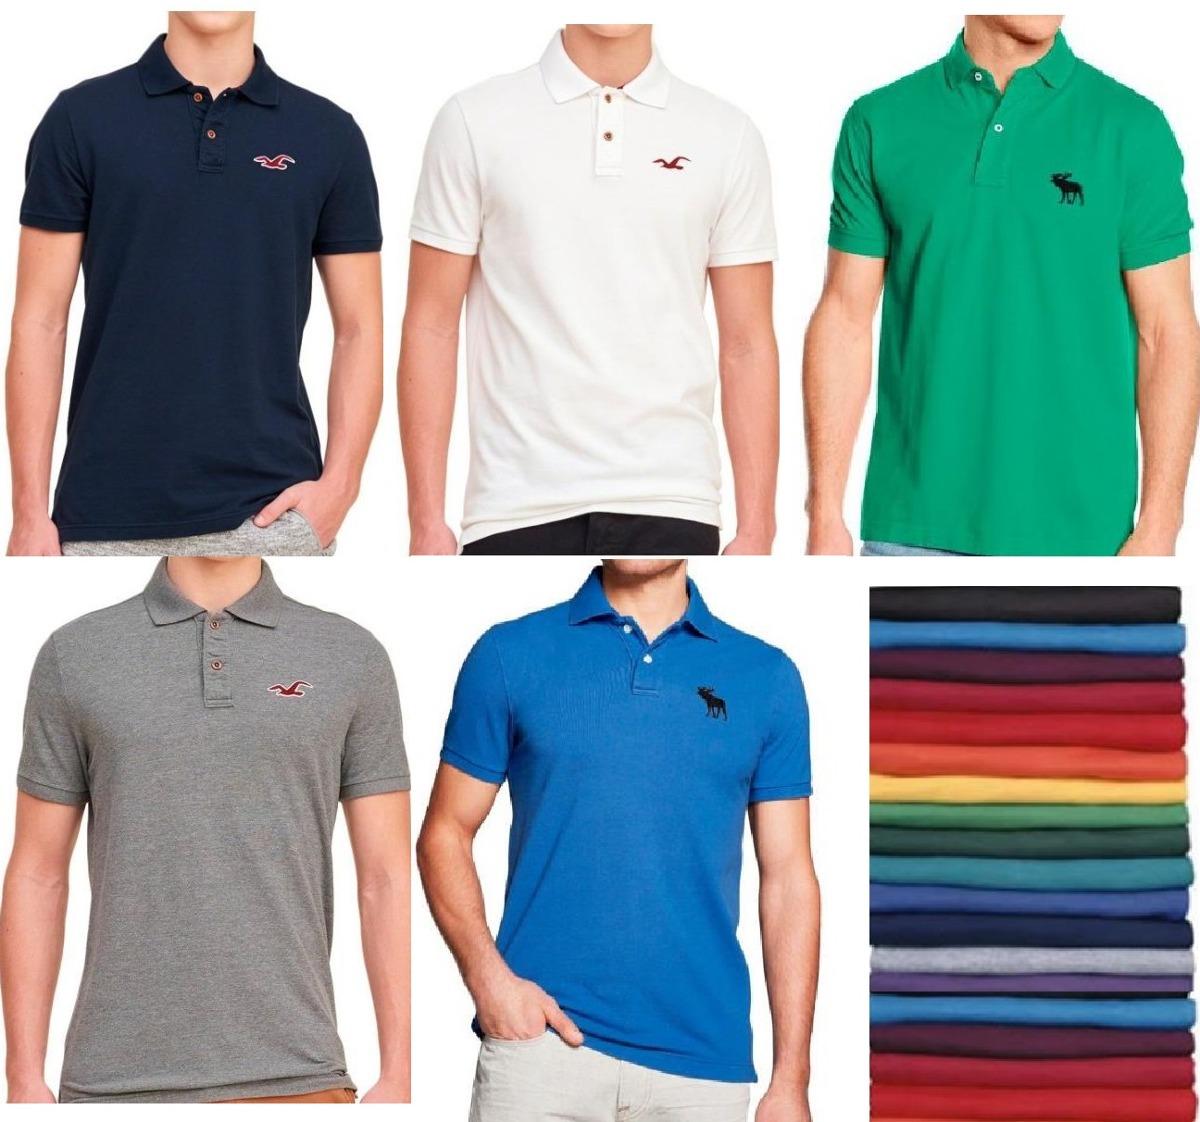 6c727c6f68aef kit 10 camiseta camisa gola polo masculina revenda atacado. Carregando zoom.